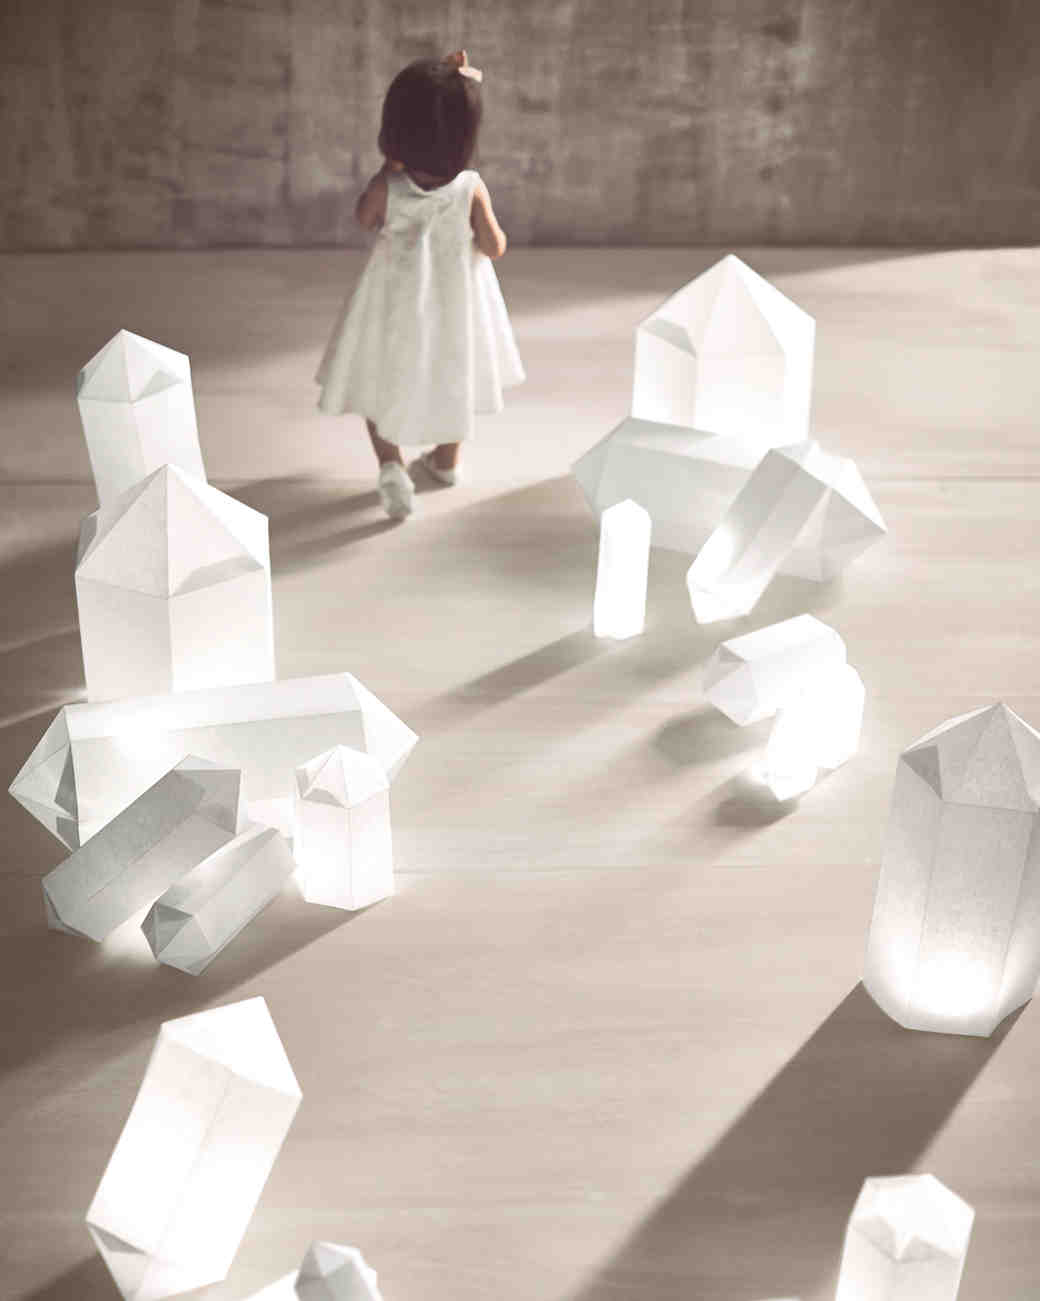 crystal-child-0056-d111475.jpg